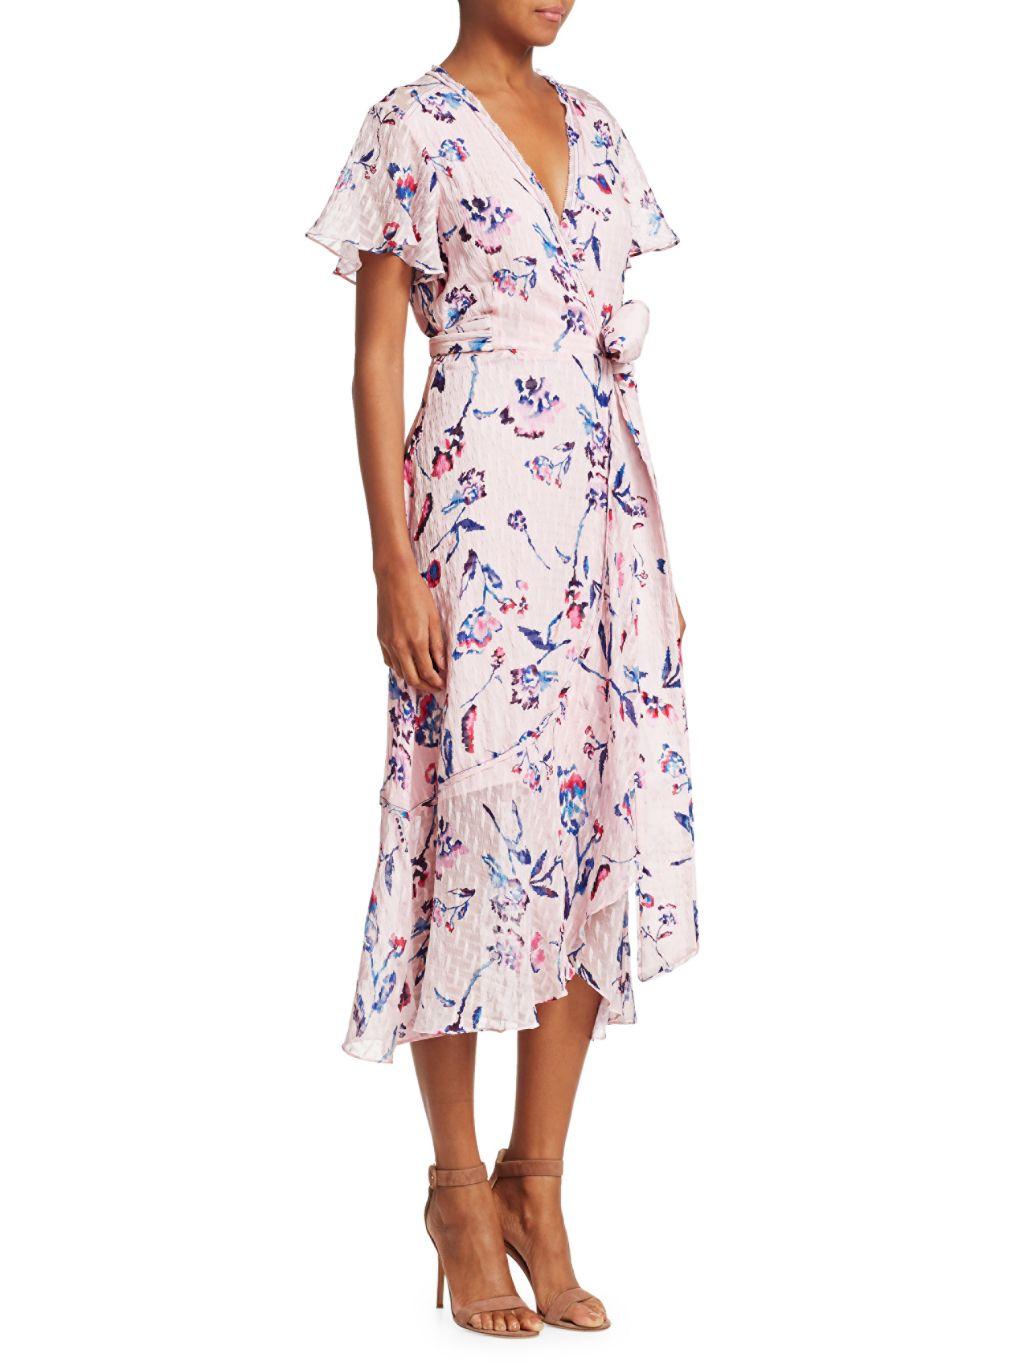 Tanya Taylor Blaire Floral Wrap Midi Dress